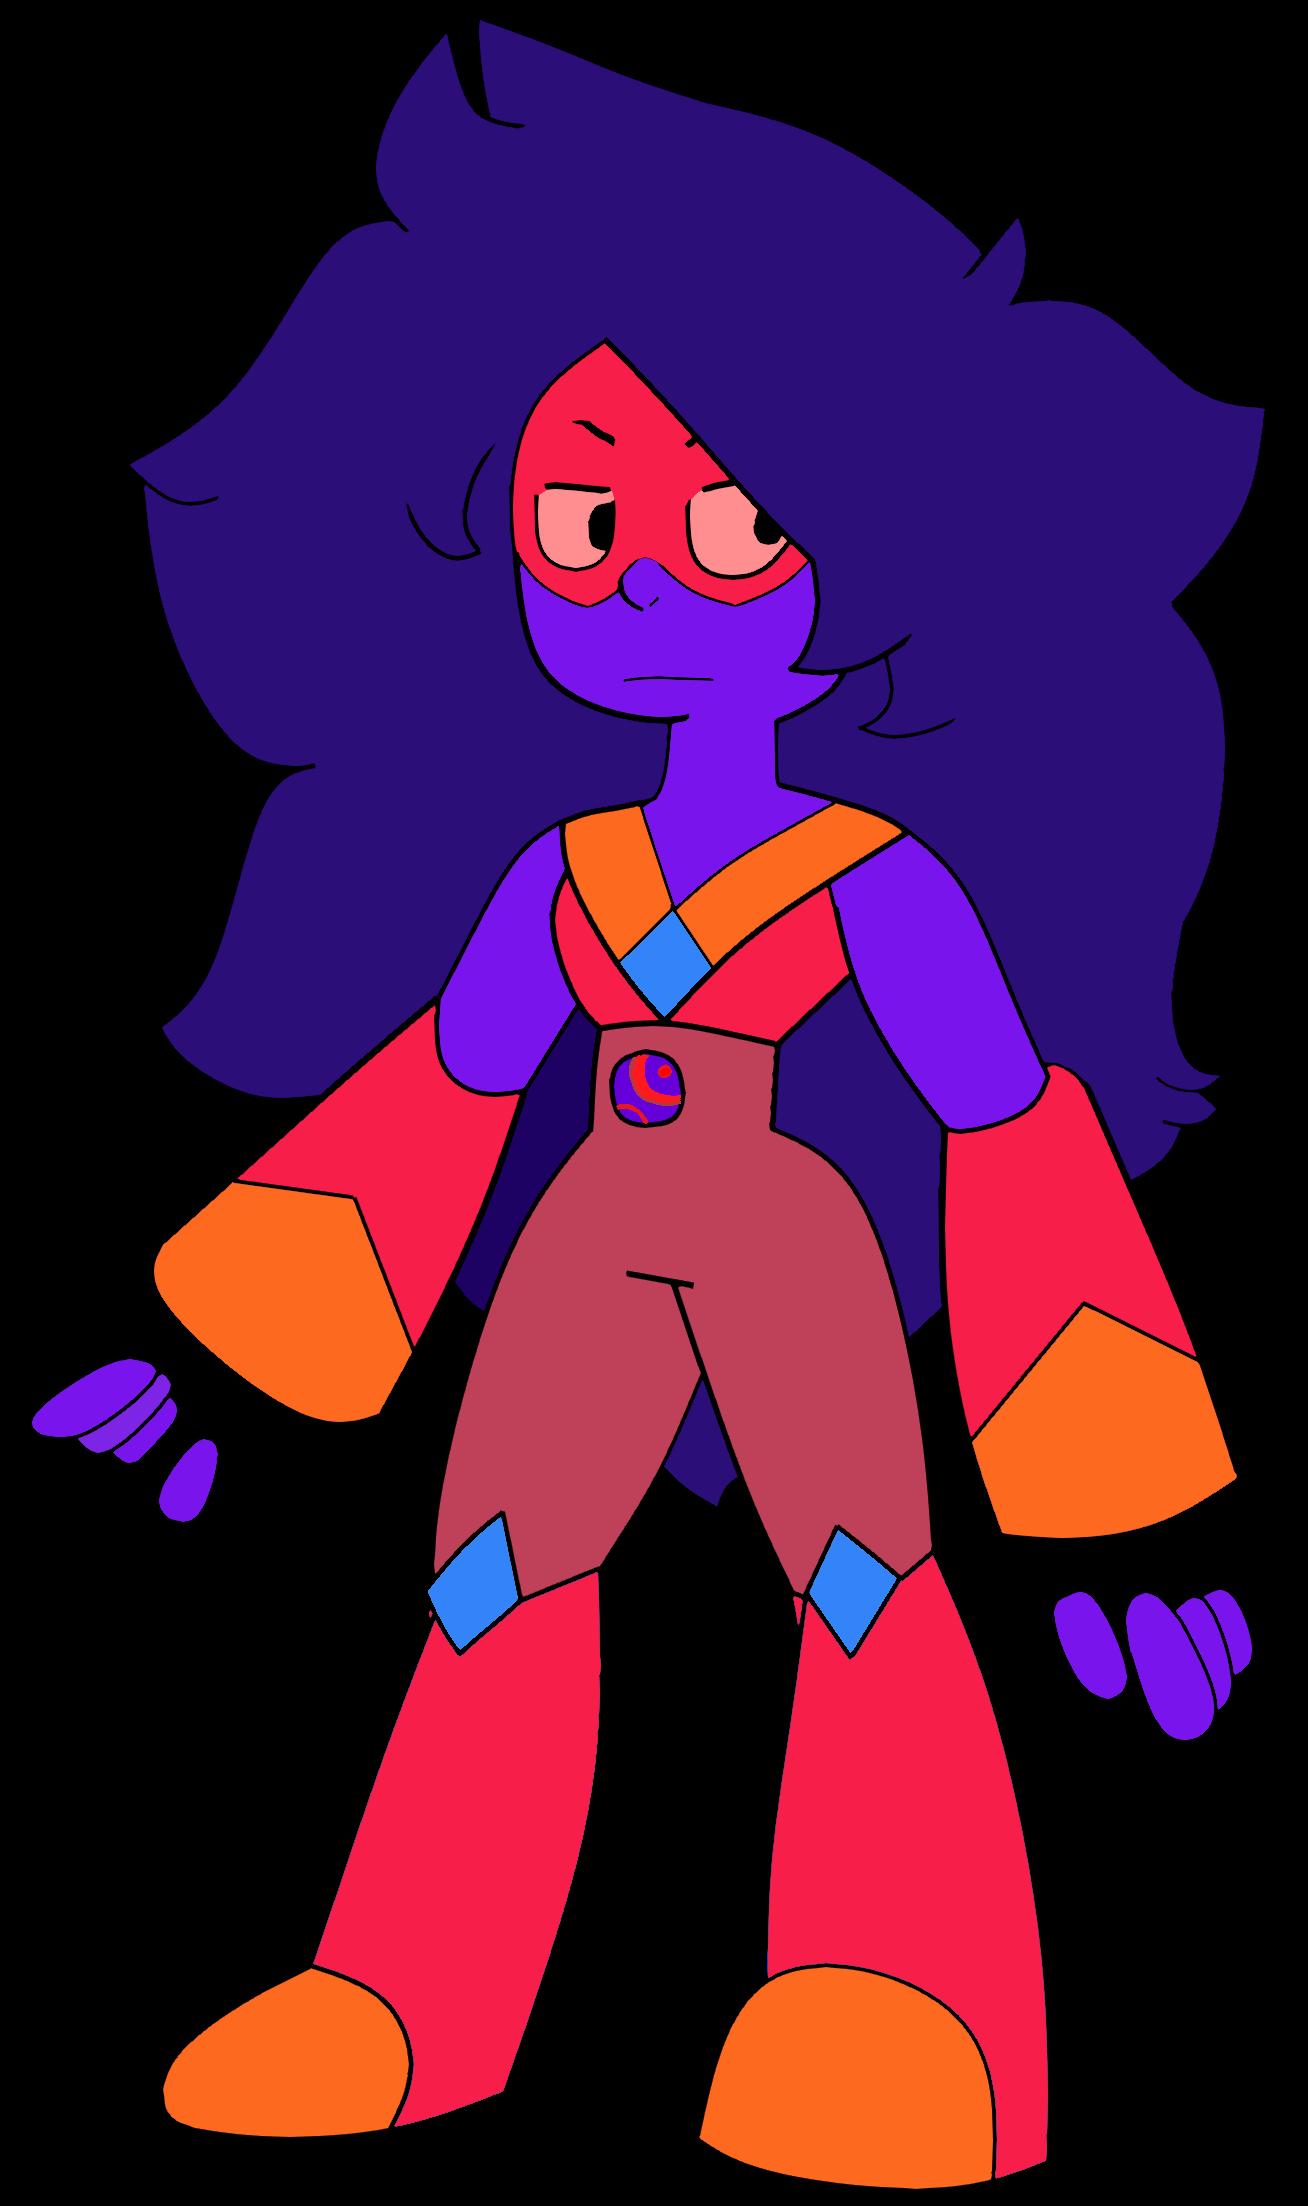 Clipart diamond translucent. Bluebird steven universe fanbase